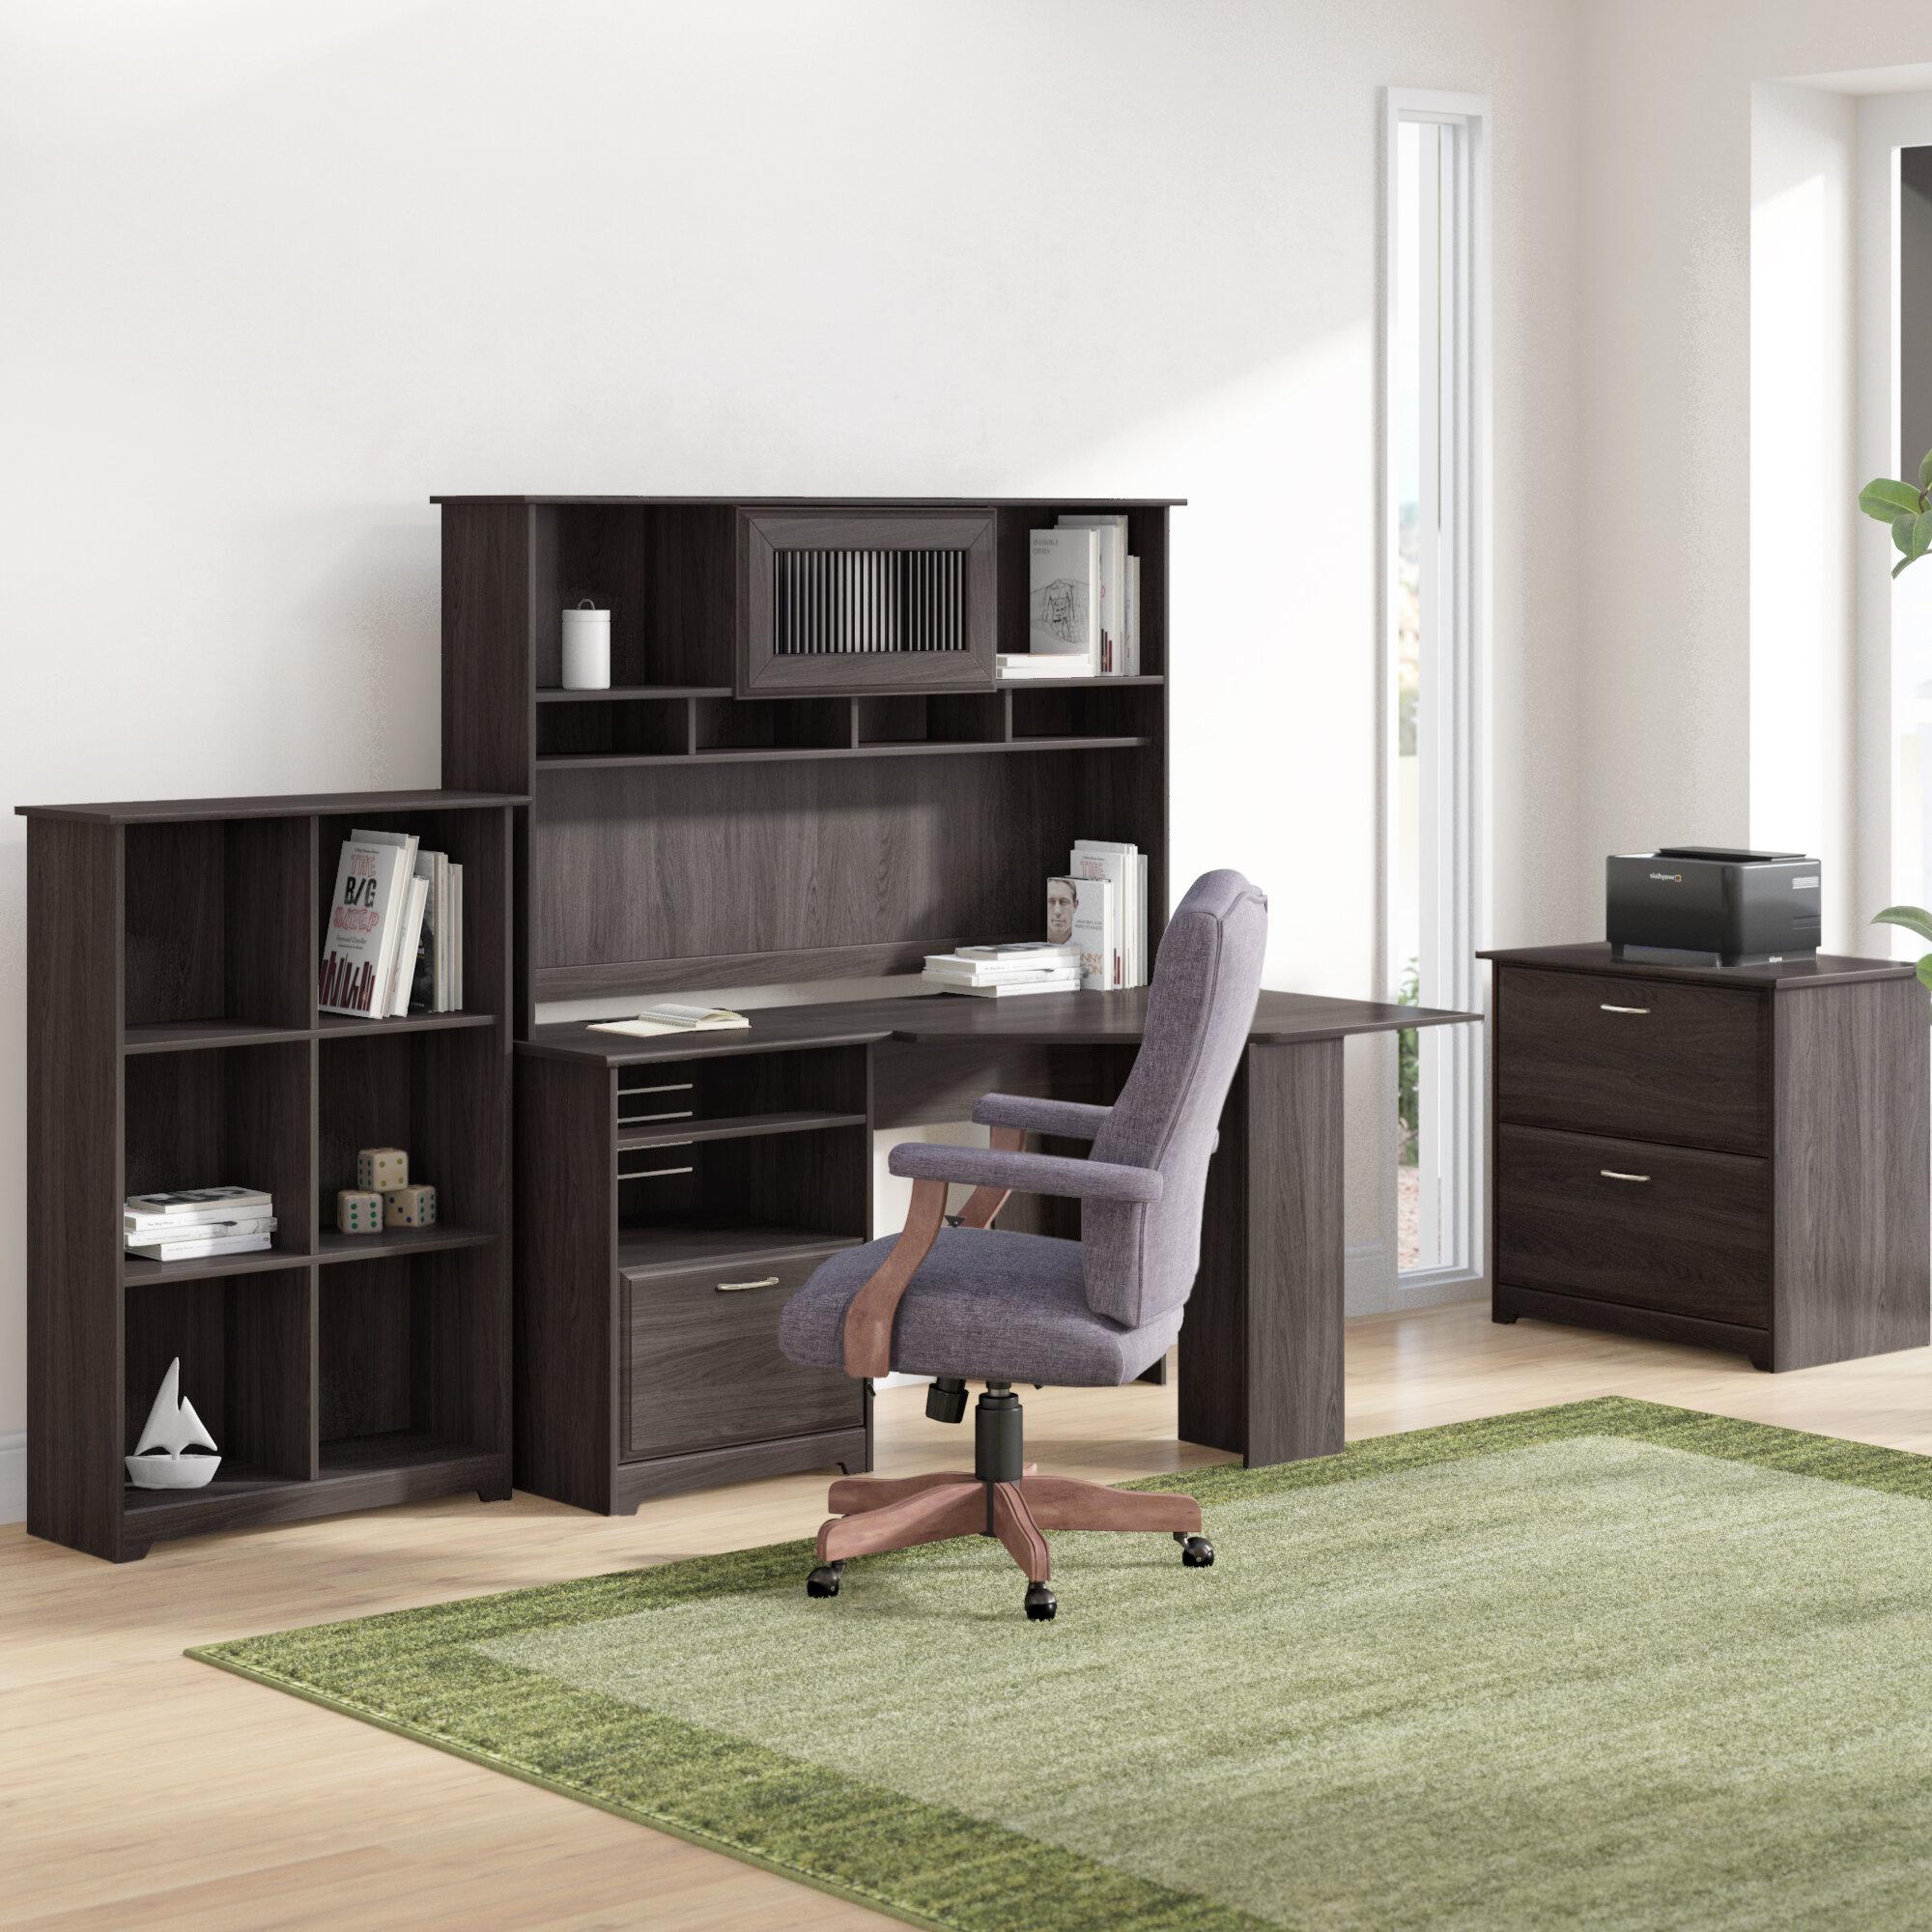 Stokke Modular Storage Unit Office Furniture Sets You Ll Love In 2021 Wayfair